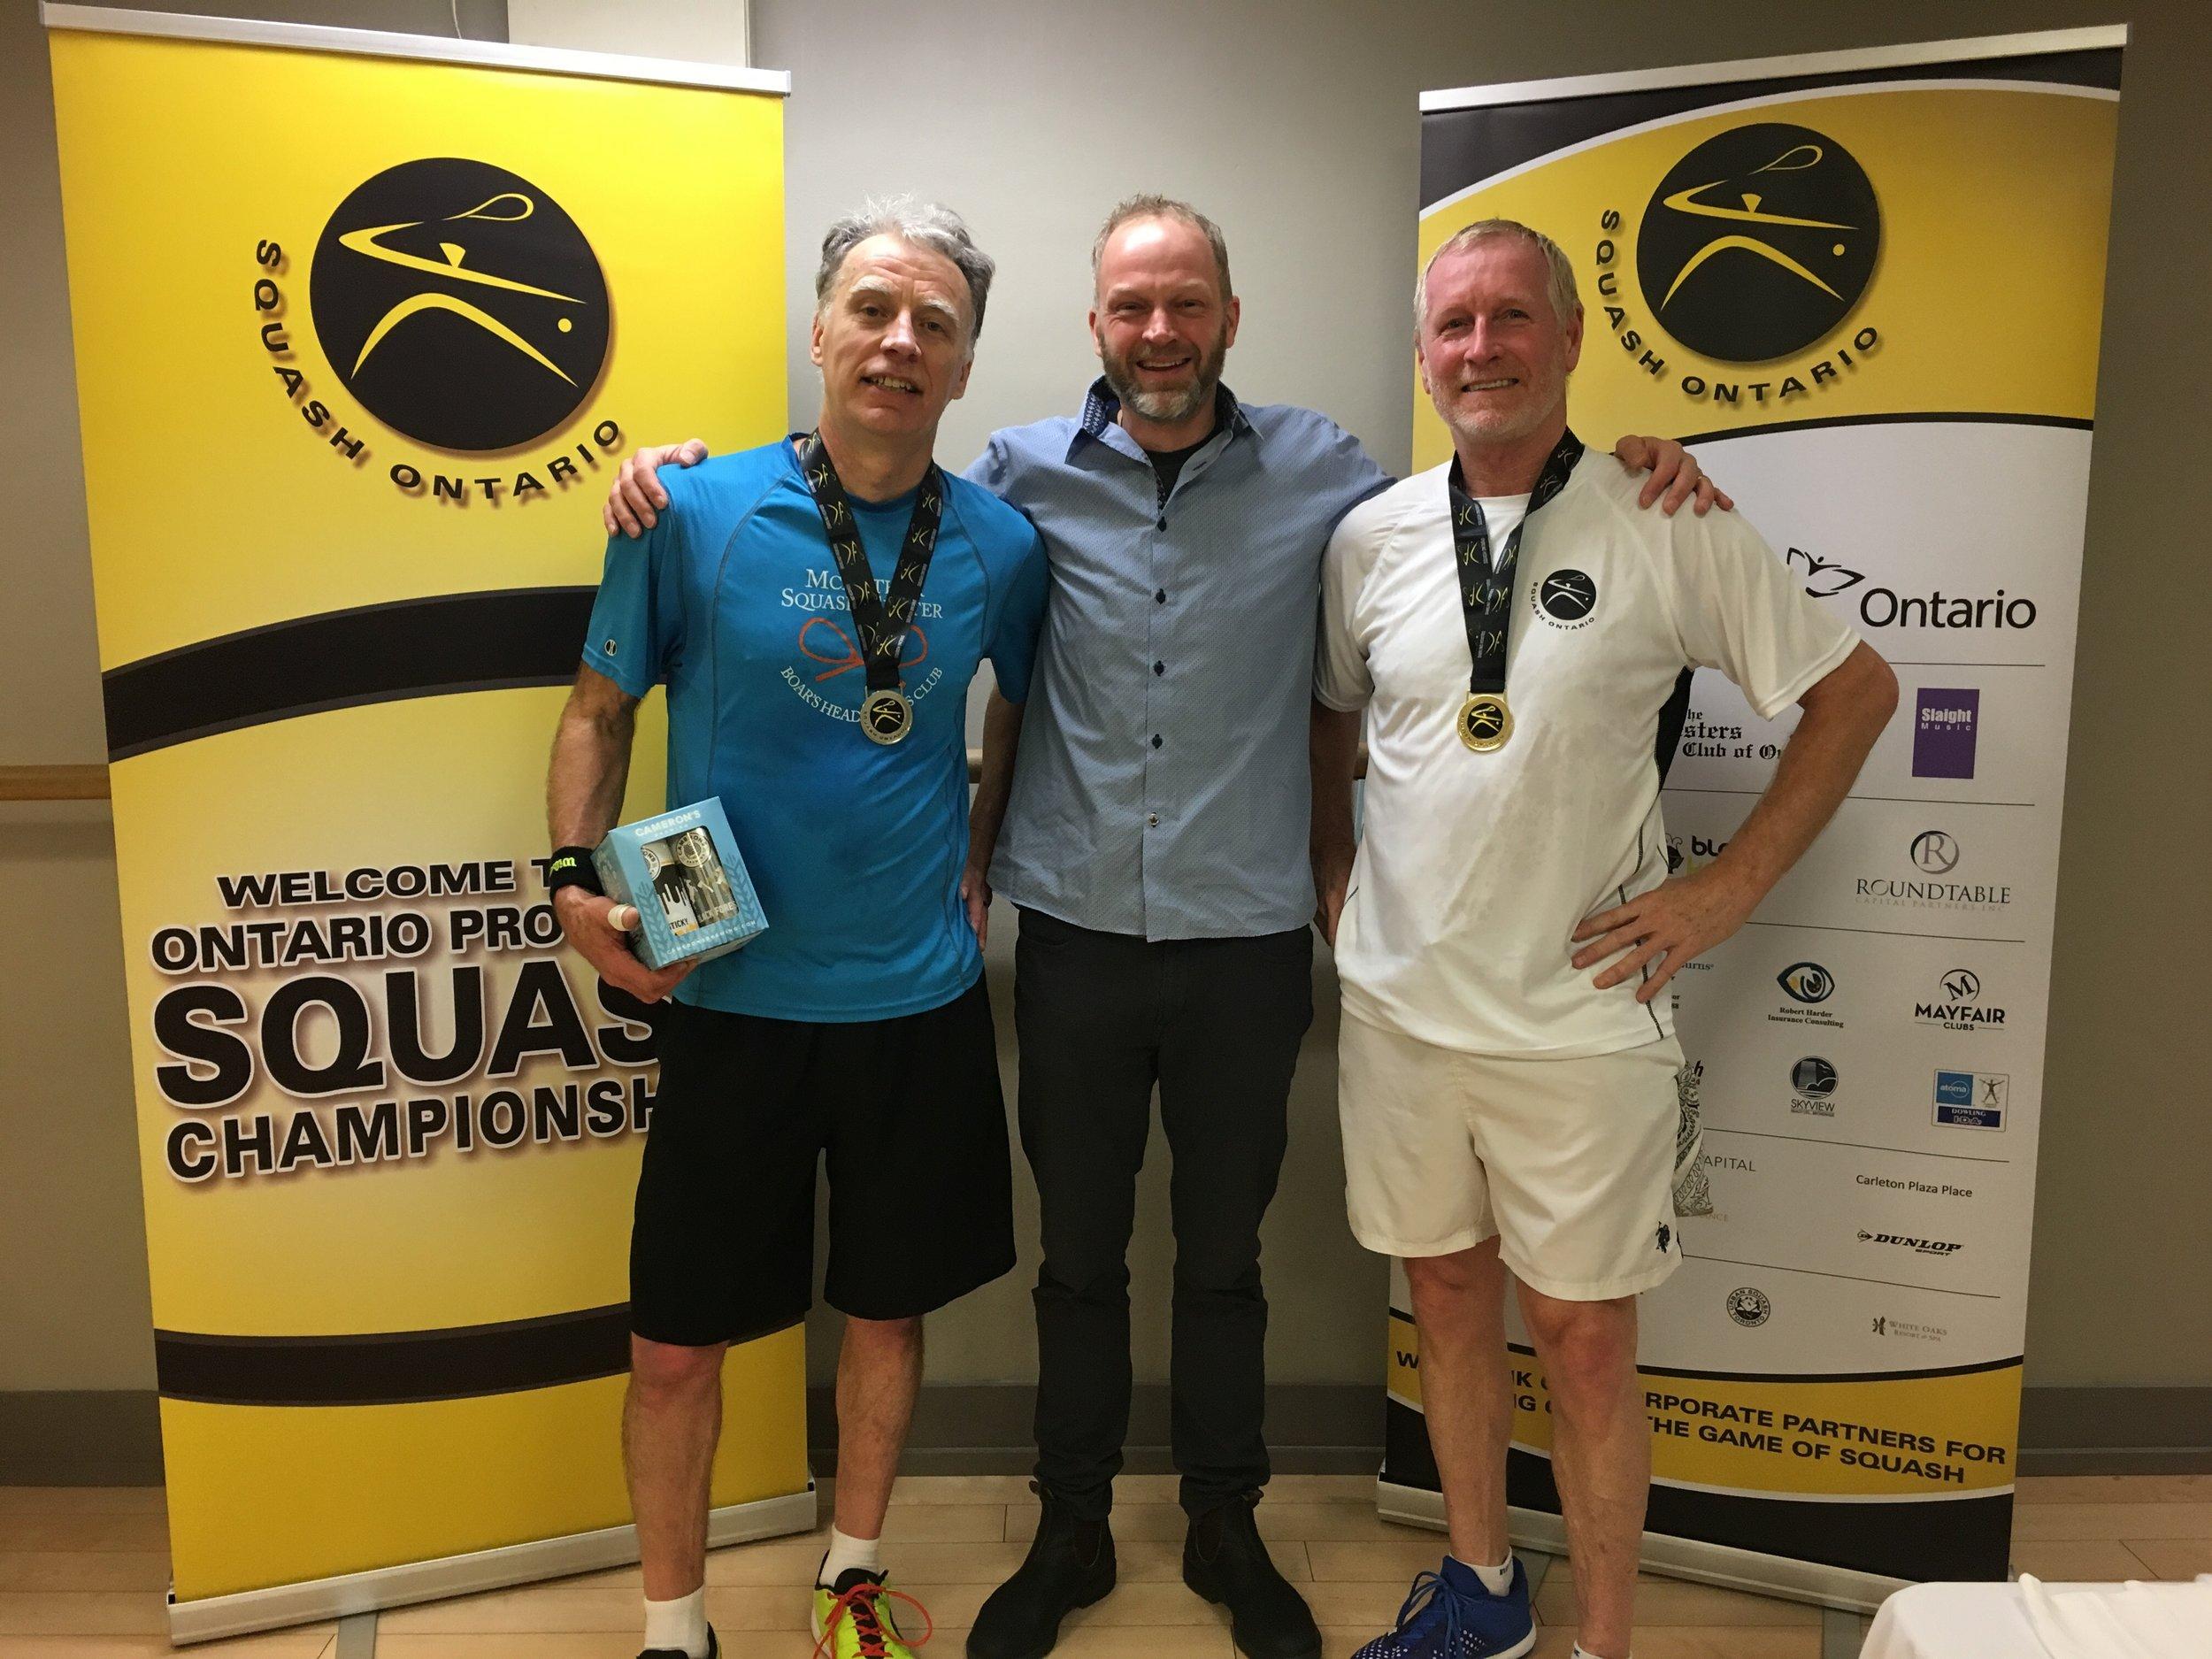 L-R: Wayne Weathehead, Squash Ontario's President Bruce Marrison, Guy Gordon